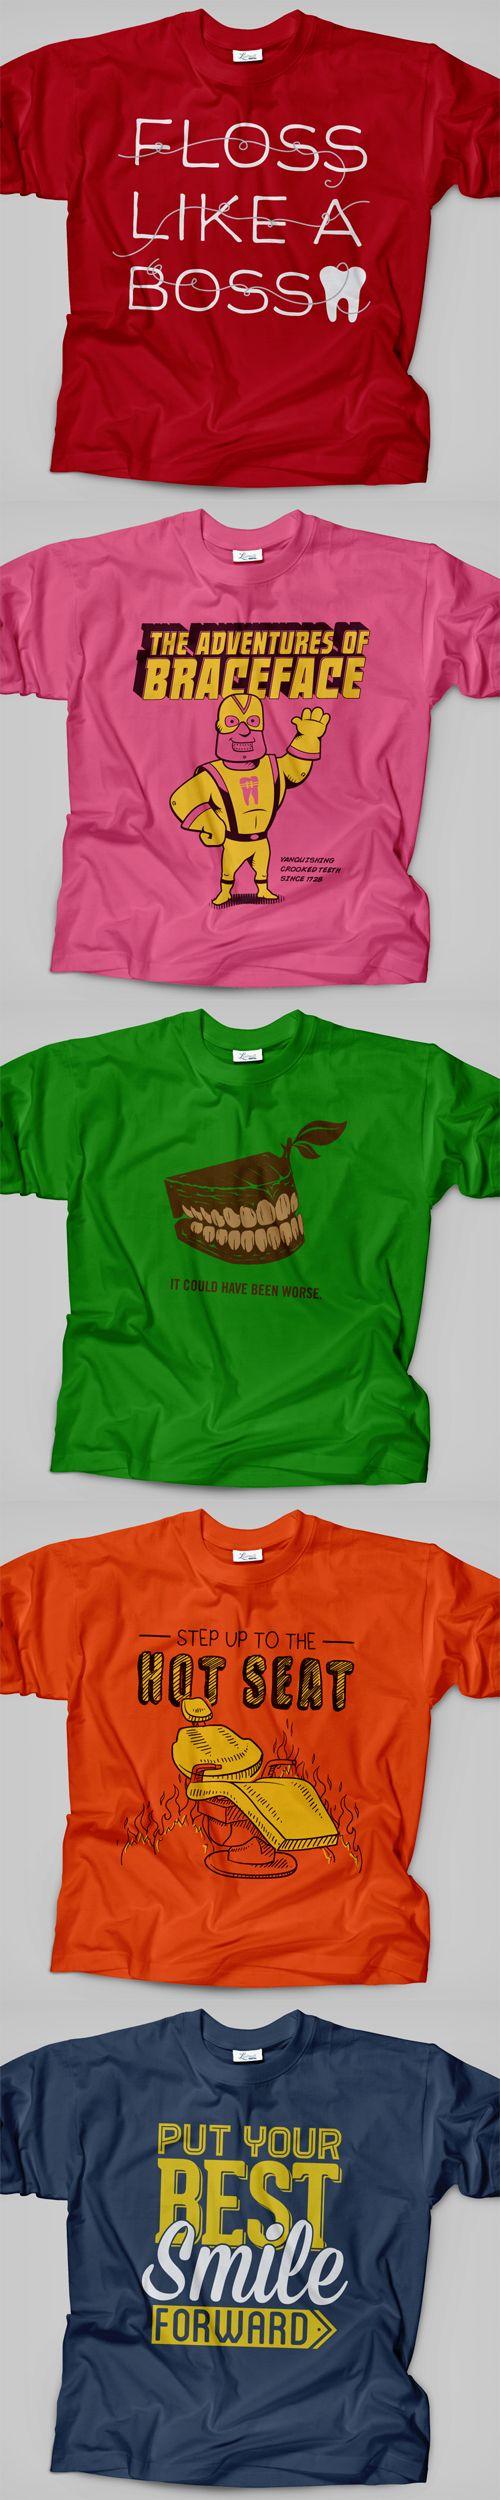 Great Dental T-Shirts!